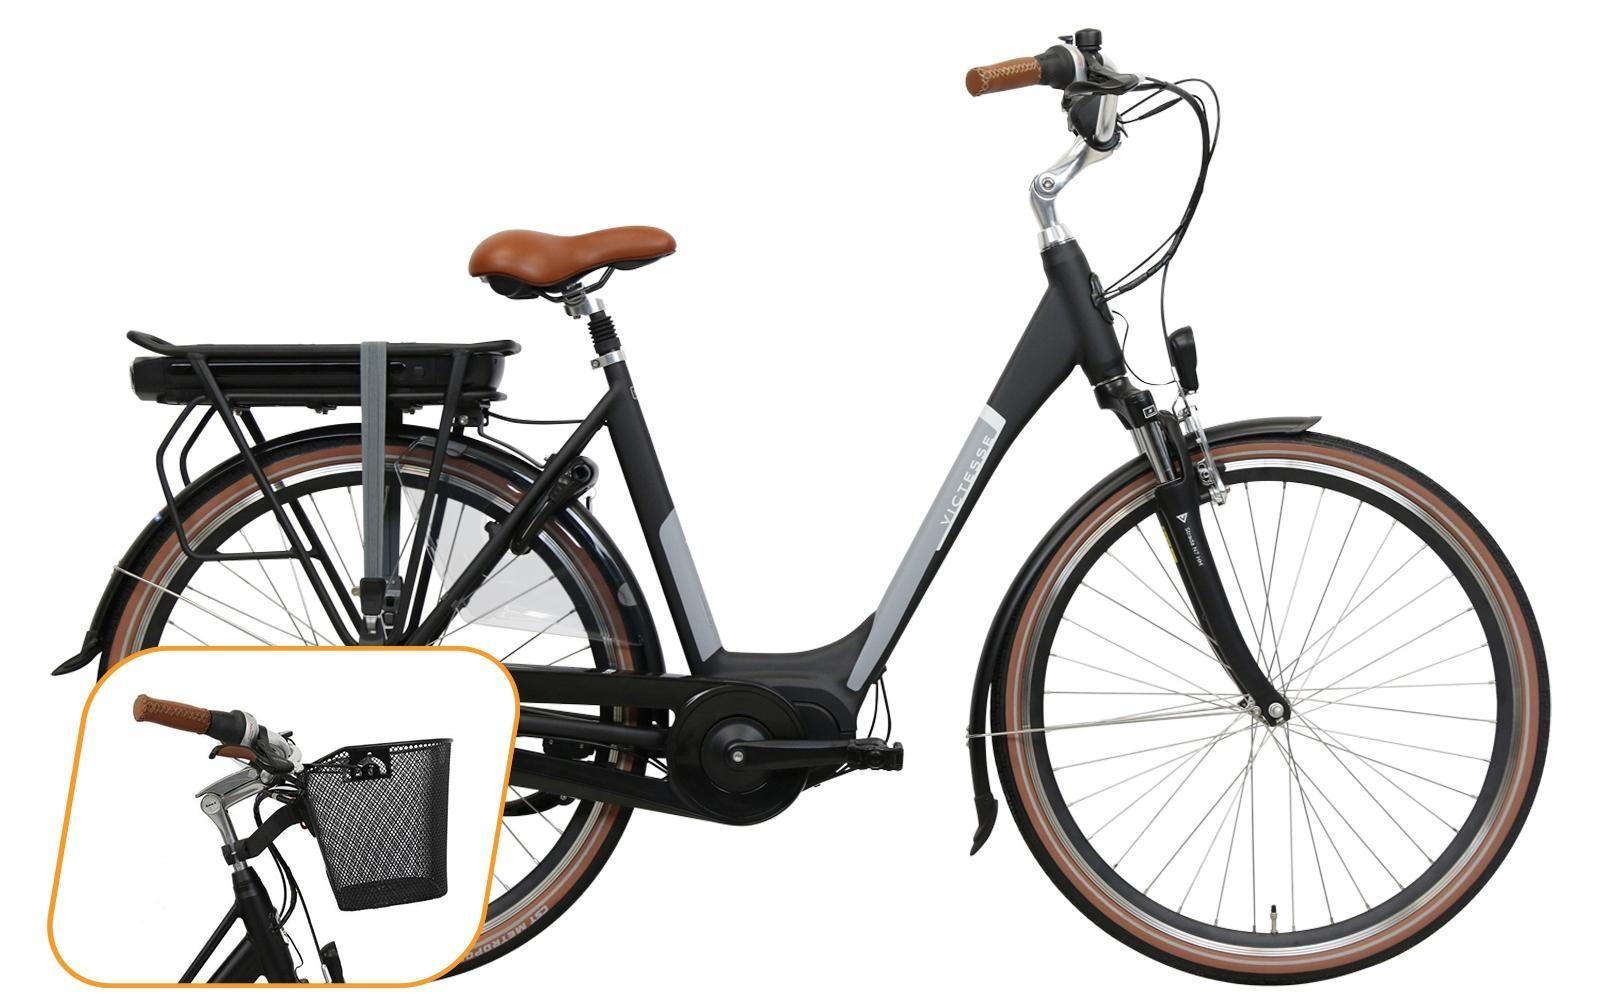 Victesse Strada Center Fodbremse 2018 Lav Indstigning Elcykel Cykel Cykler